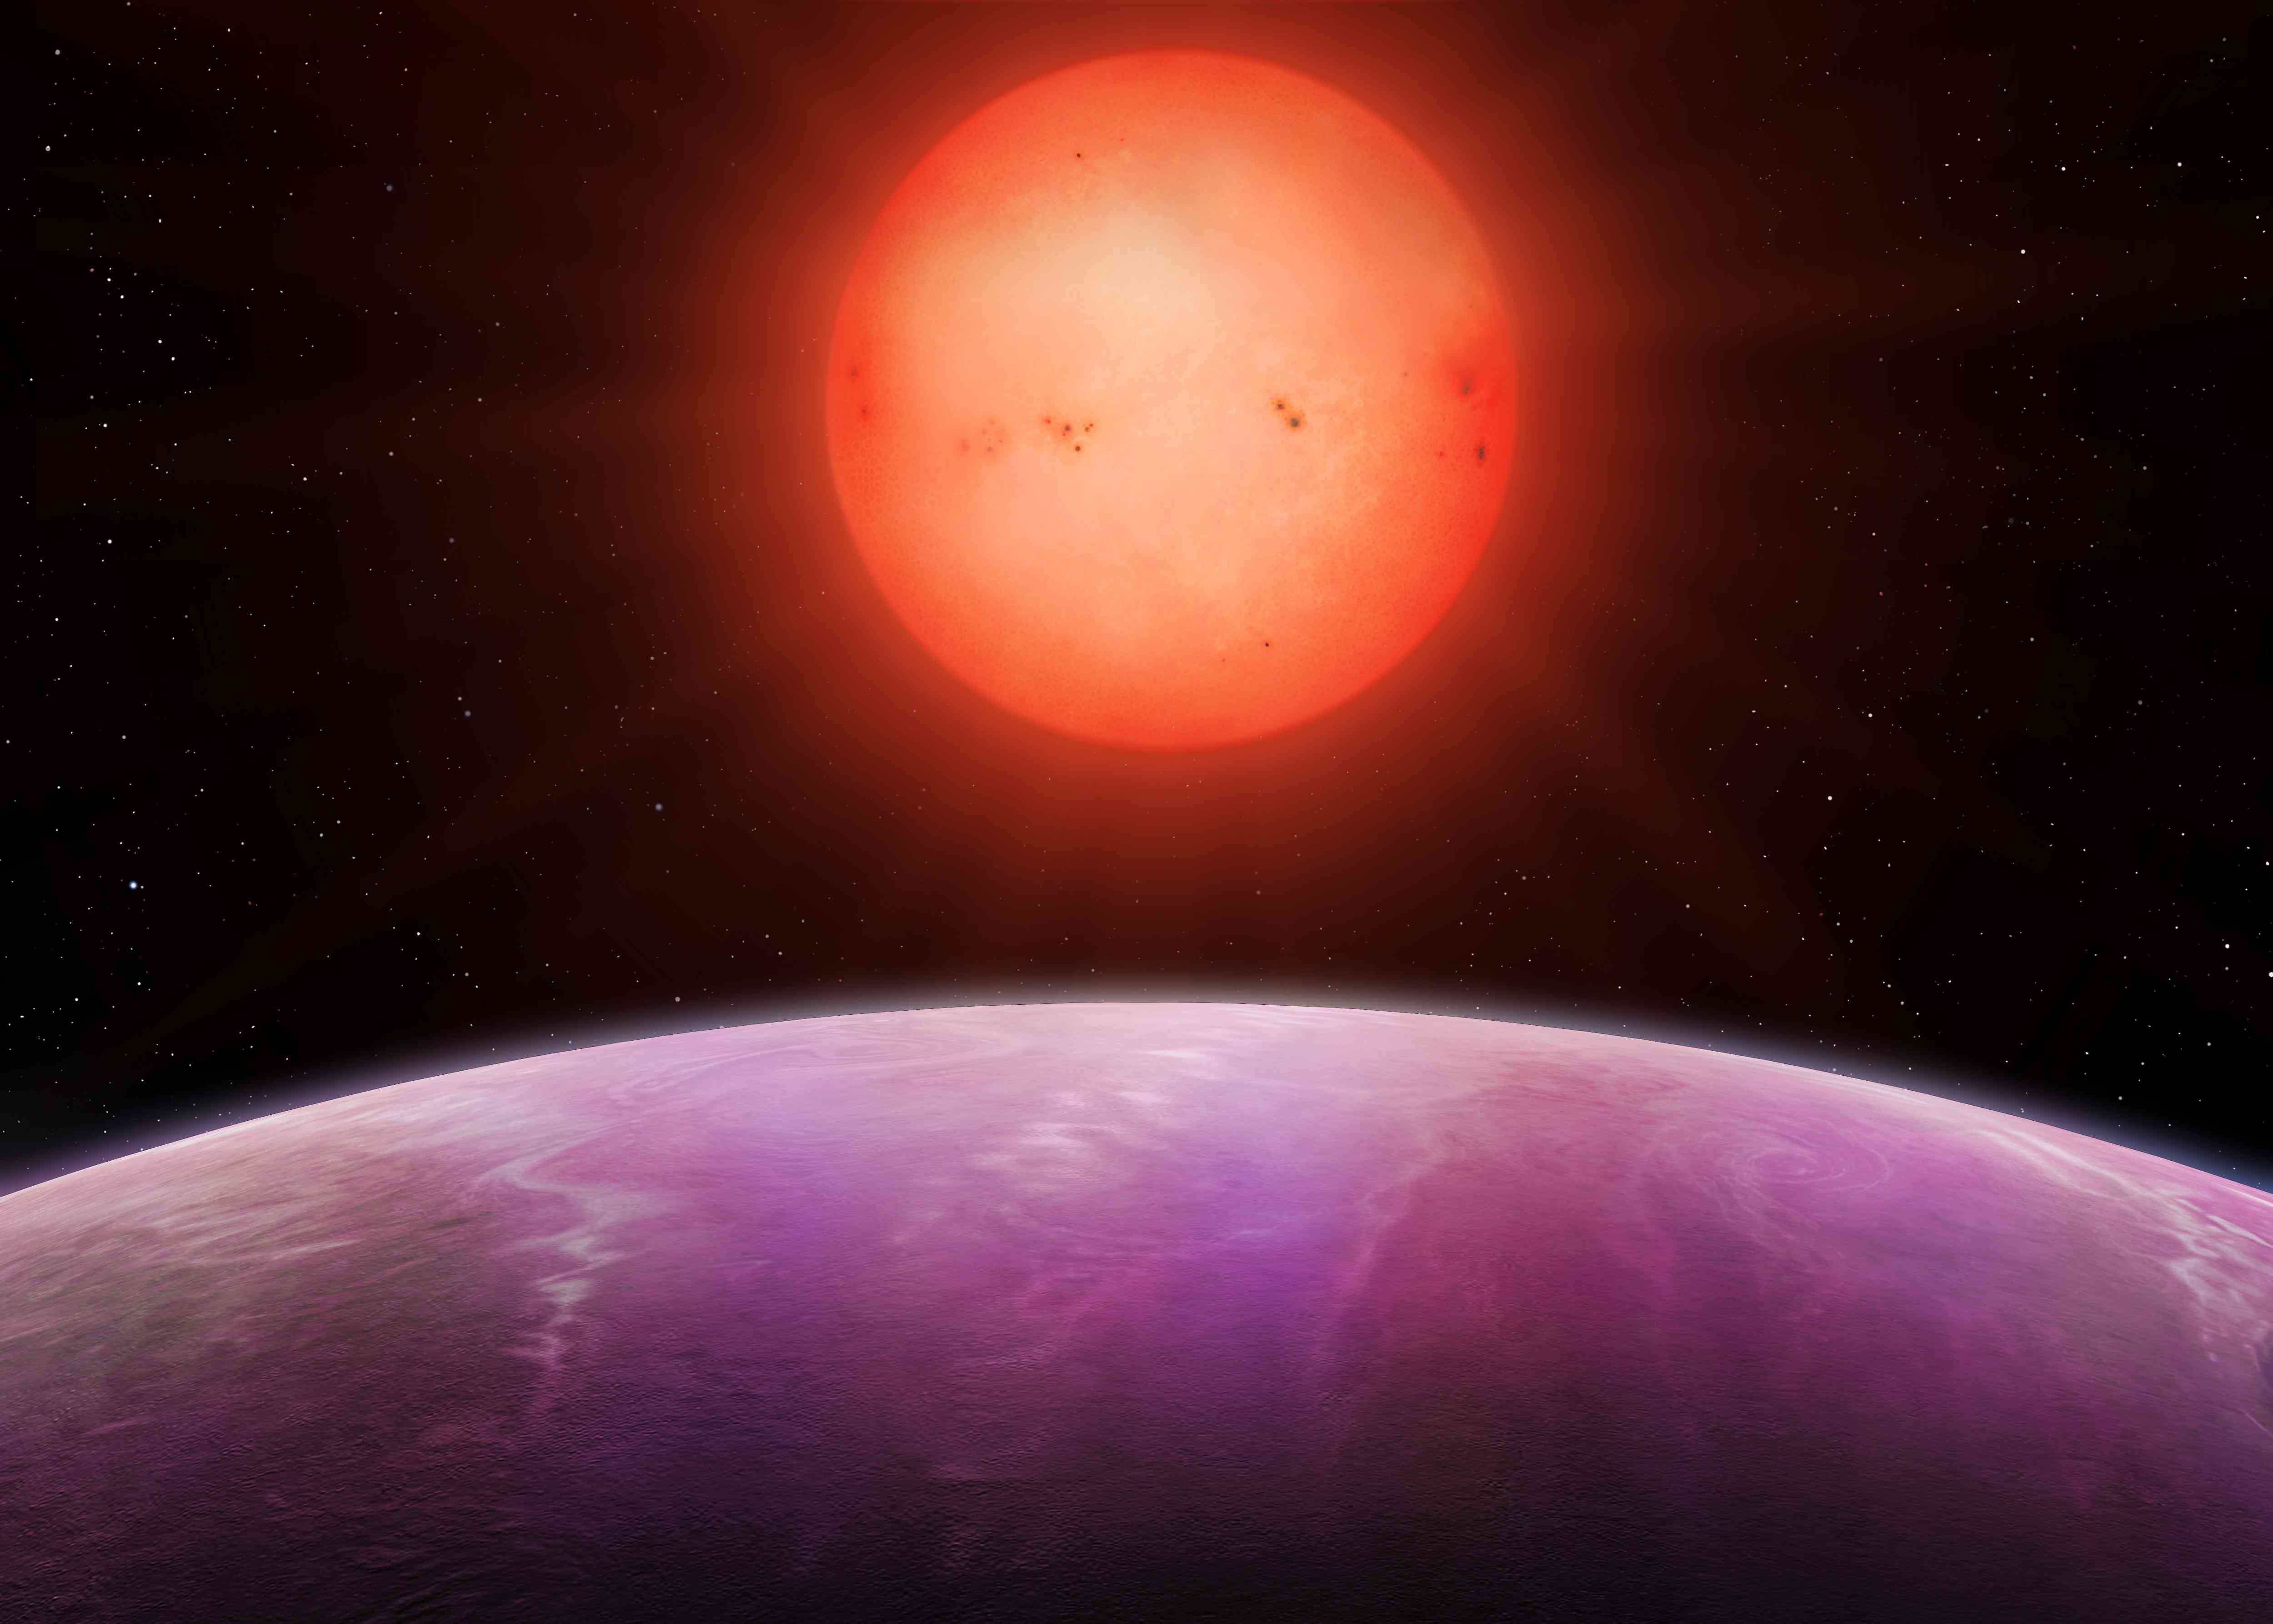 Artist rendering of a red dwarf.